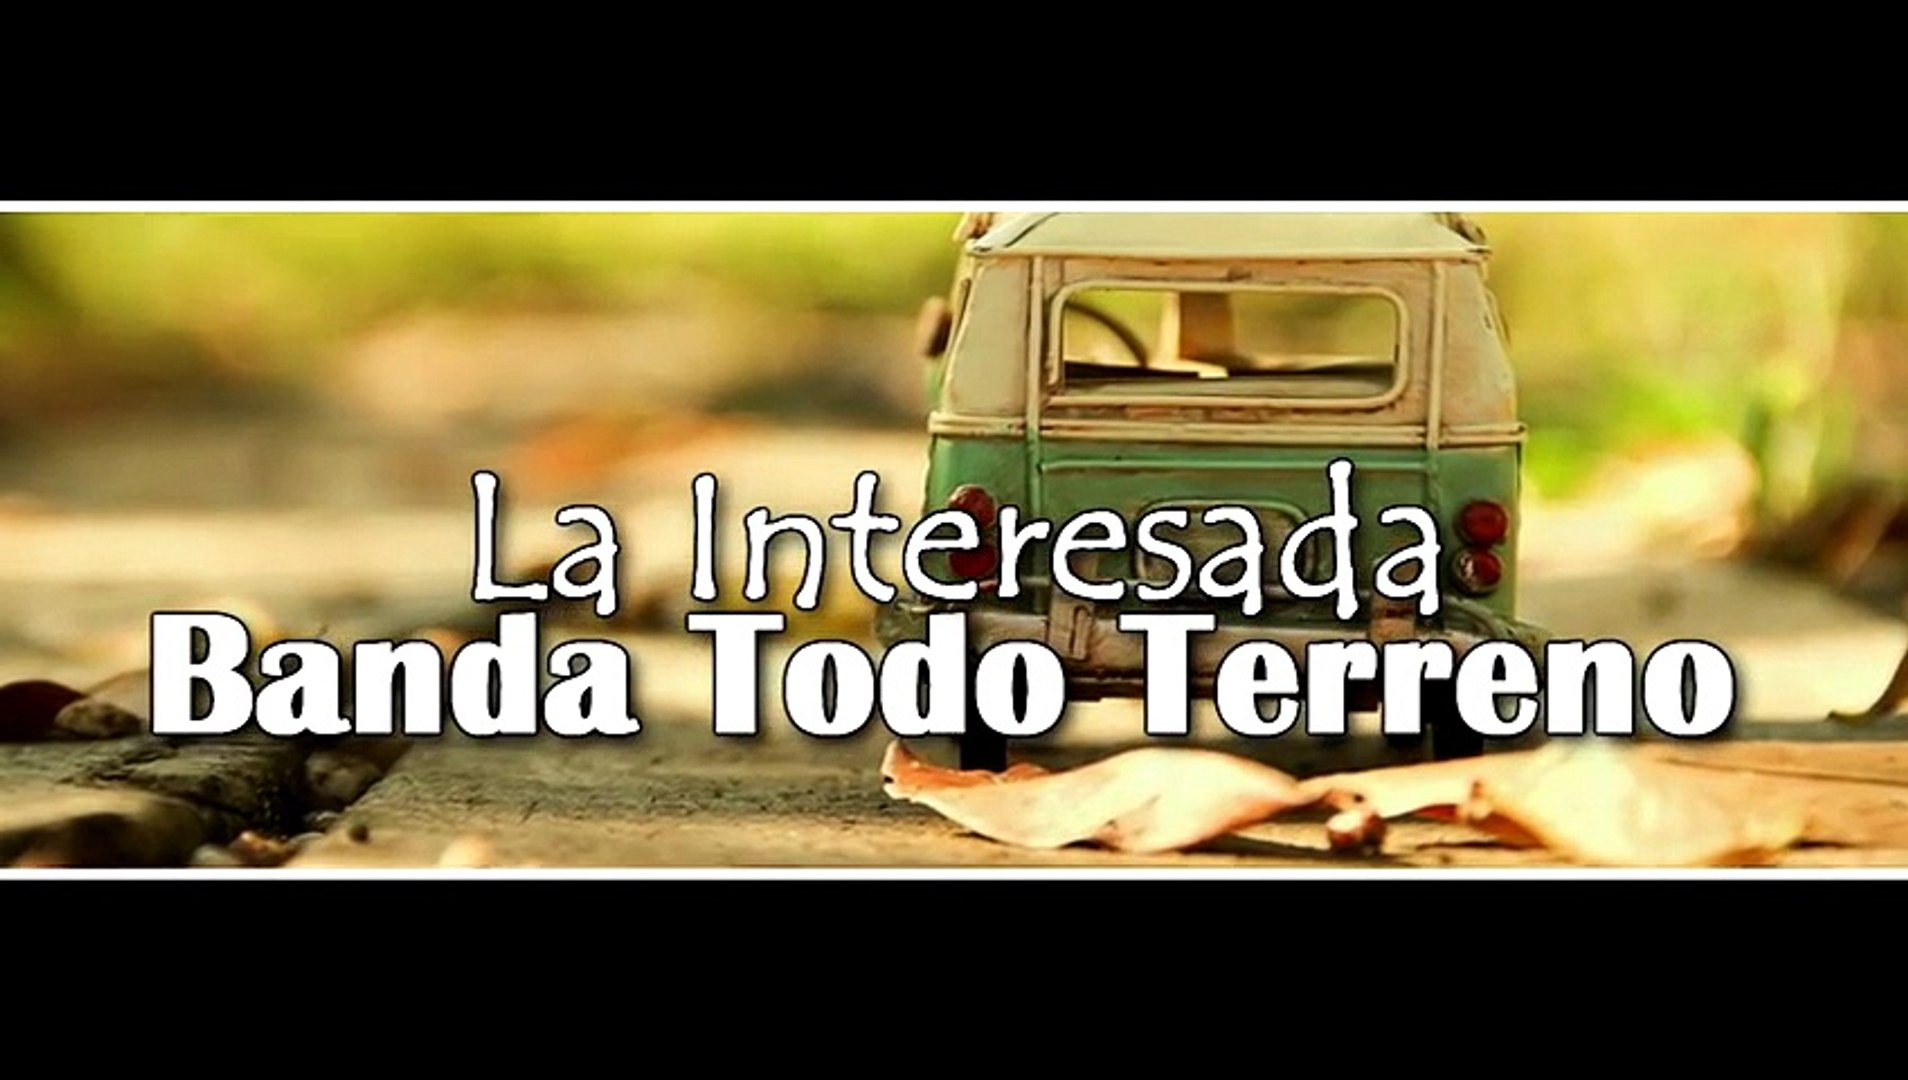 Banda Todo Terreno - La Interesada [Vídeo Lyrics] [Música de banda 2015]